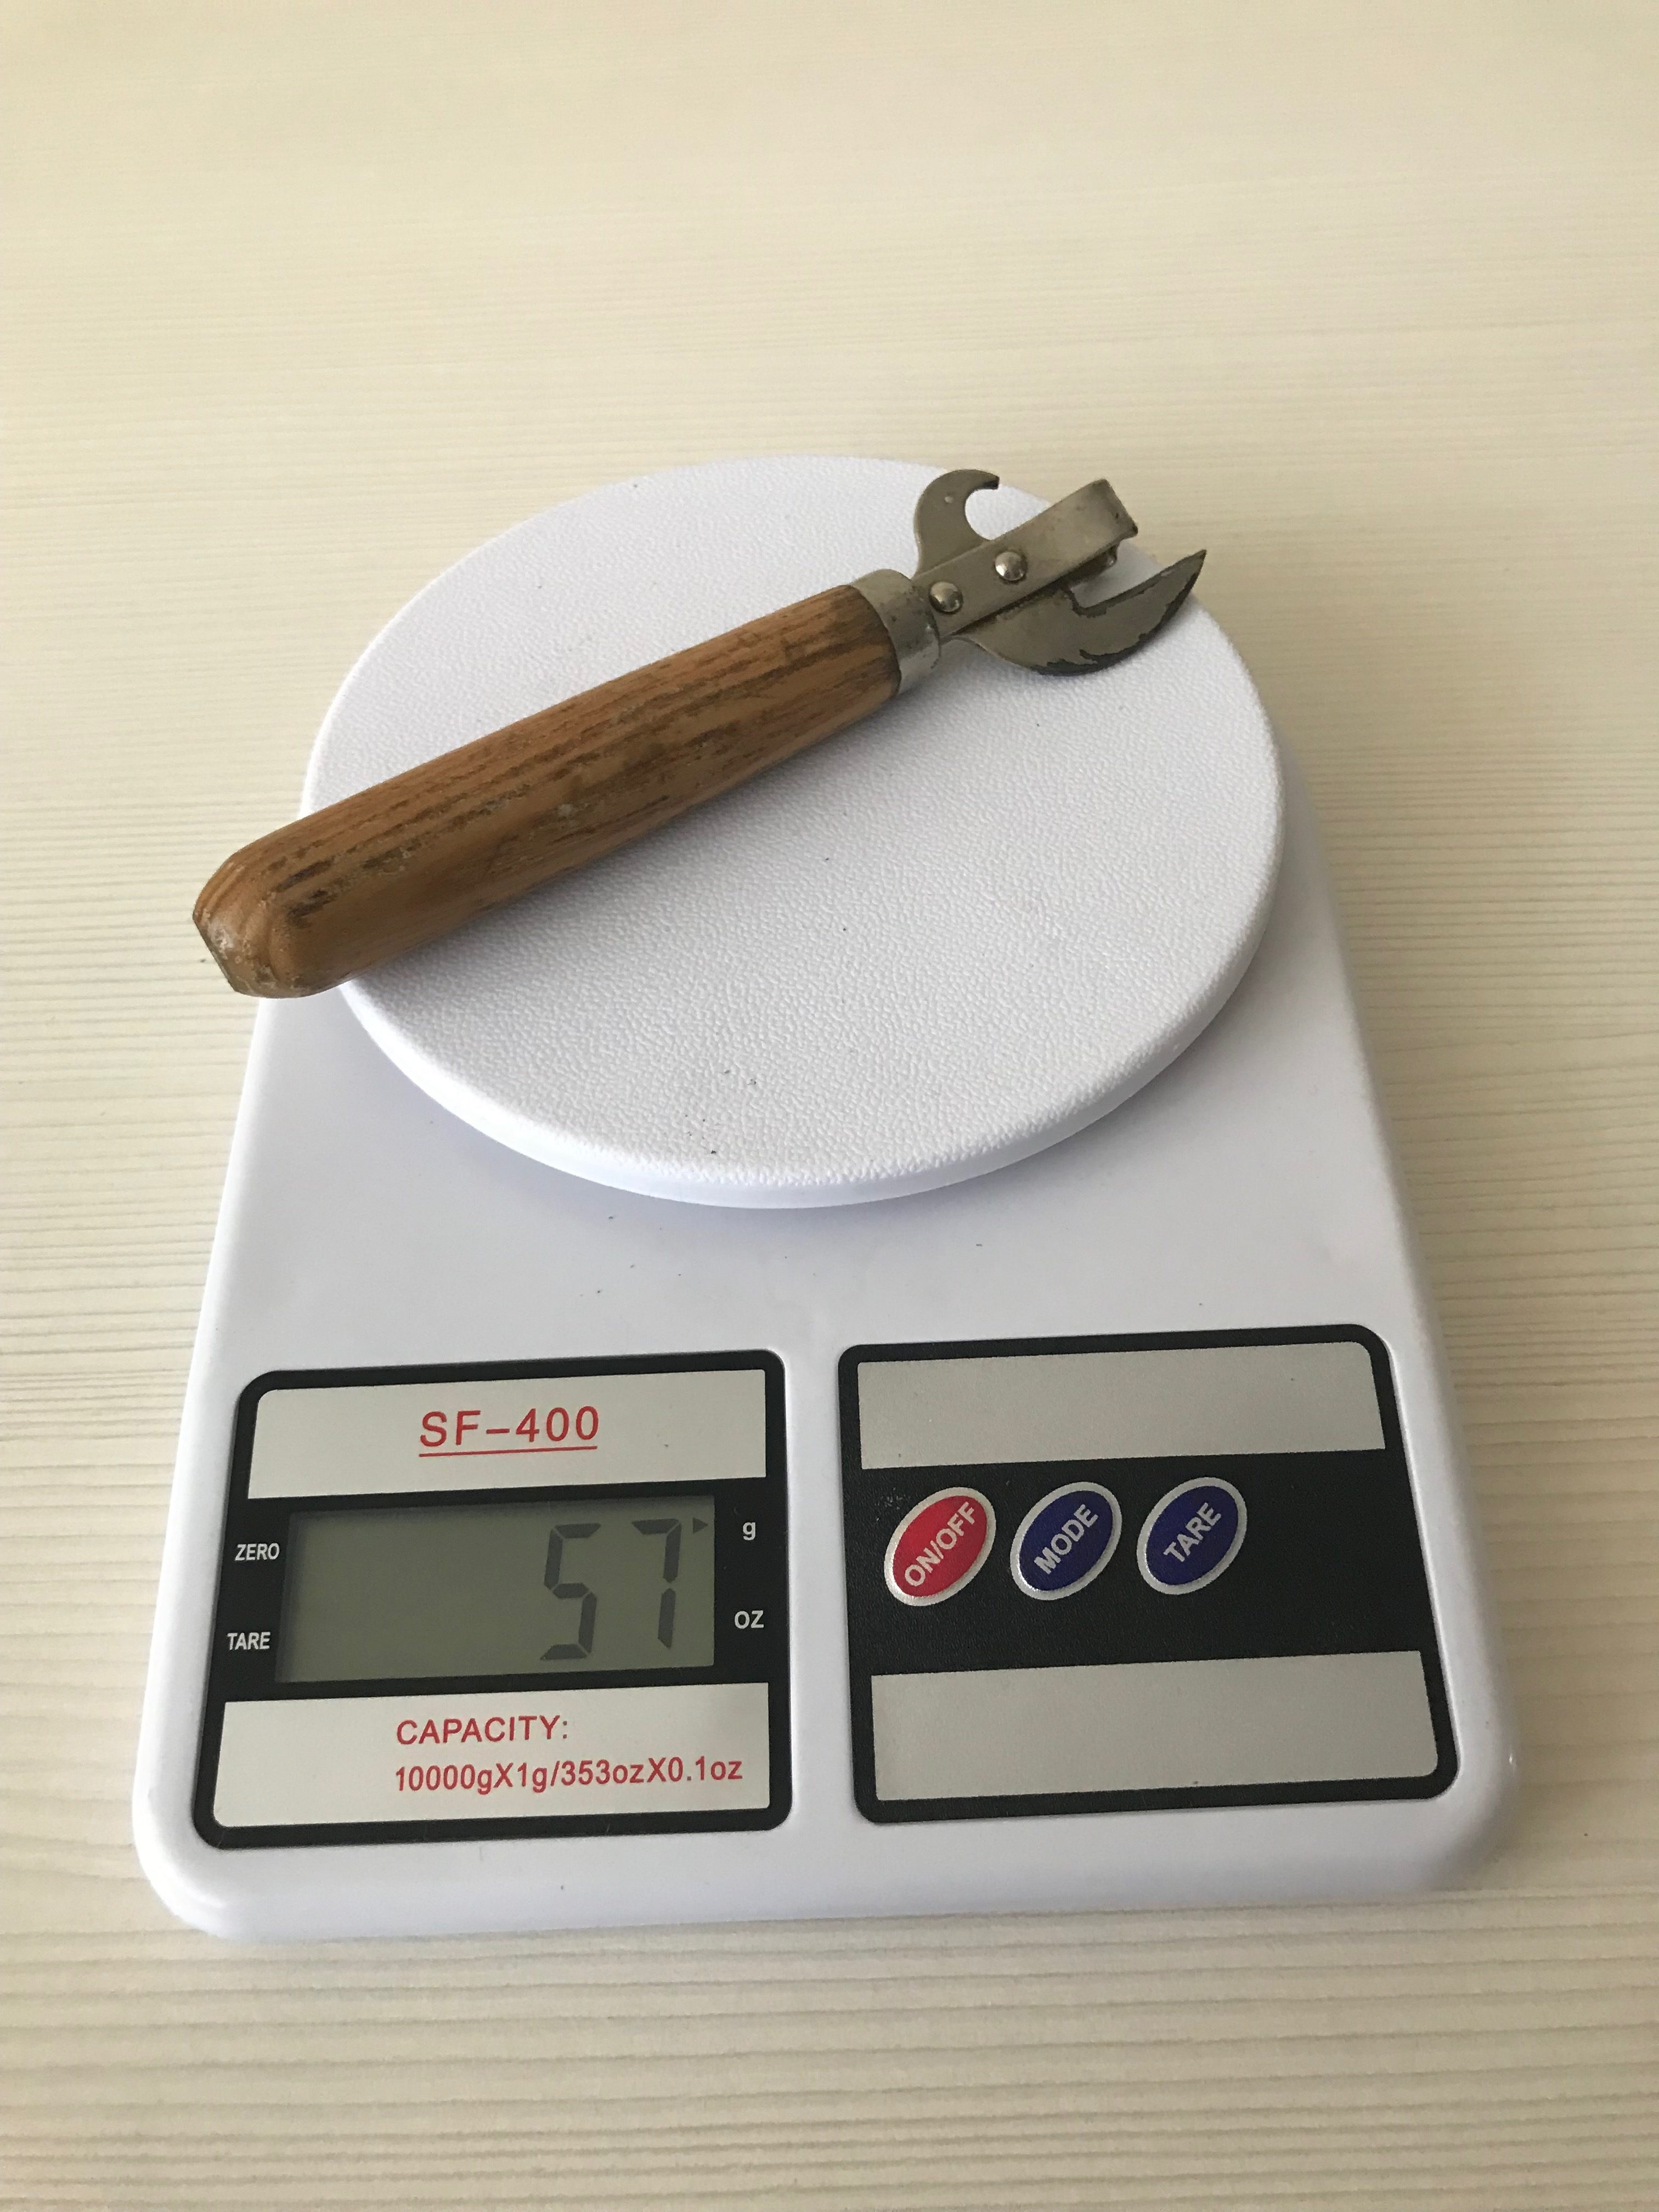 вес открывашки